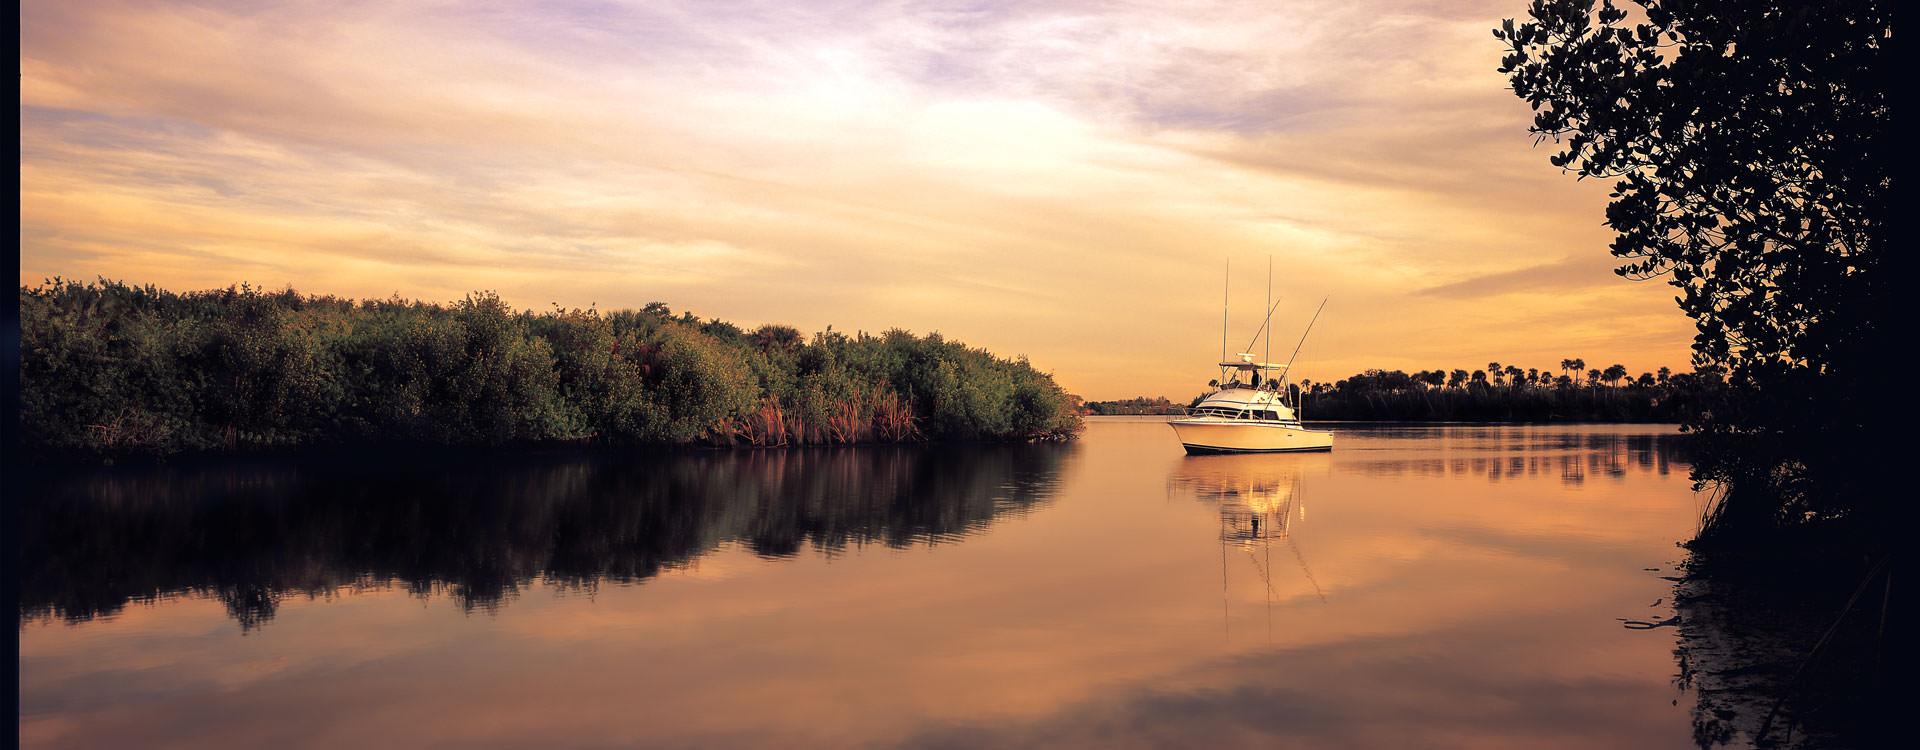 homeSlider_boat